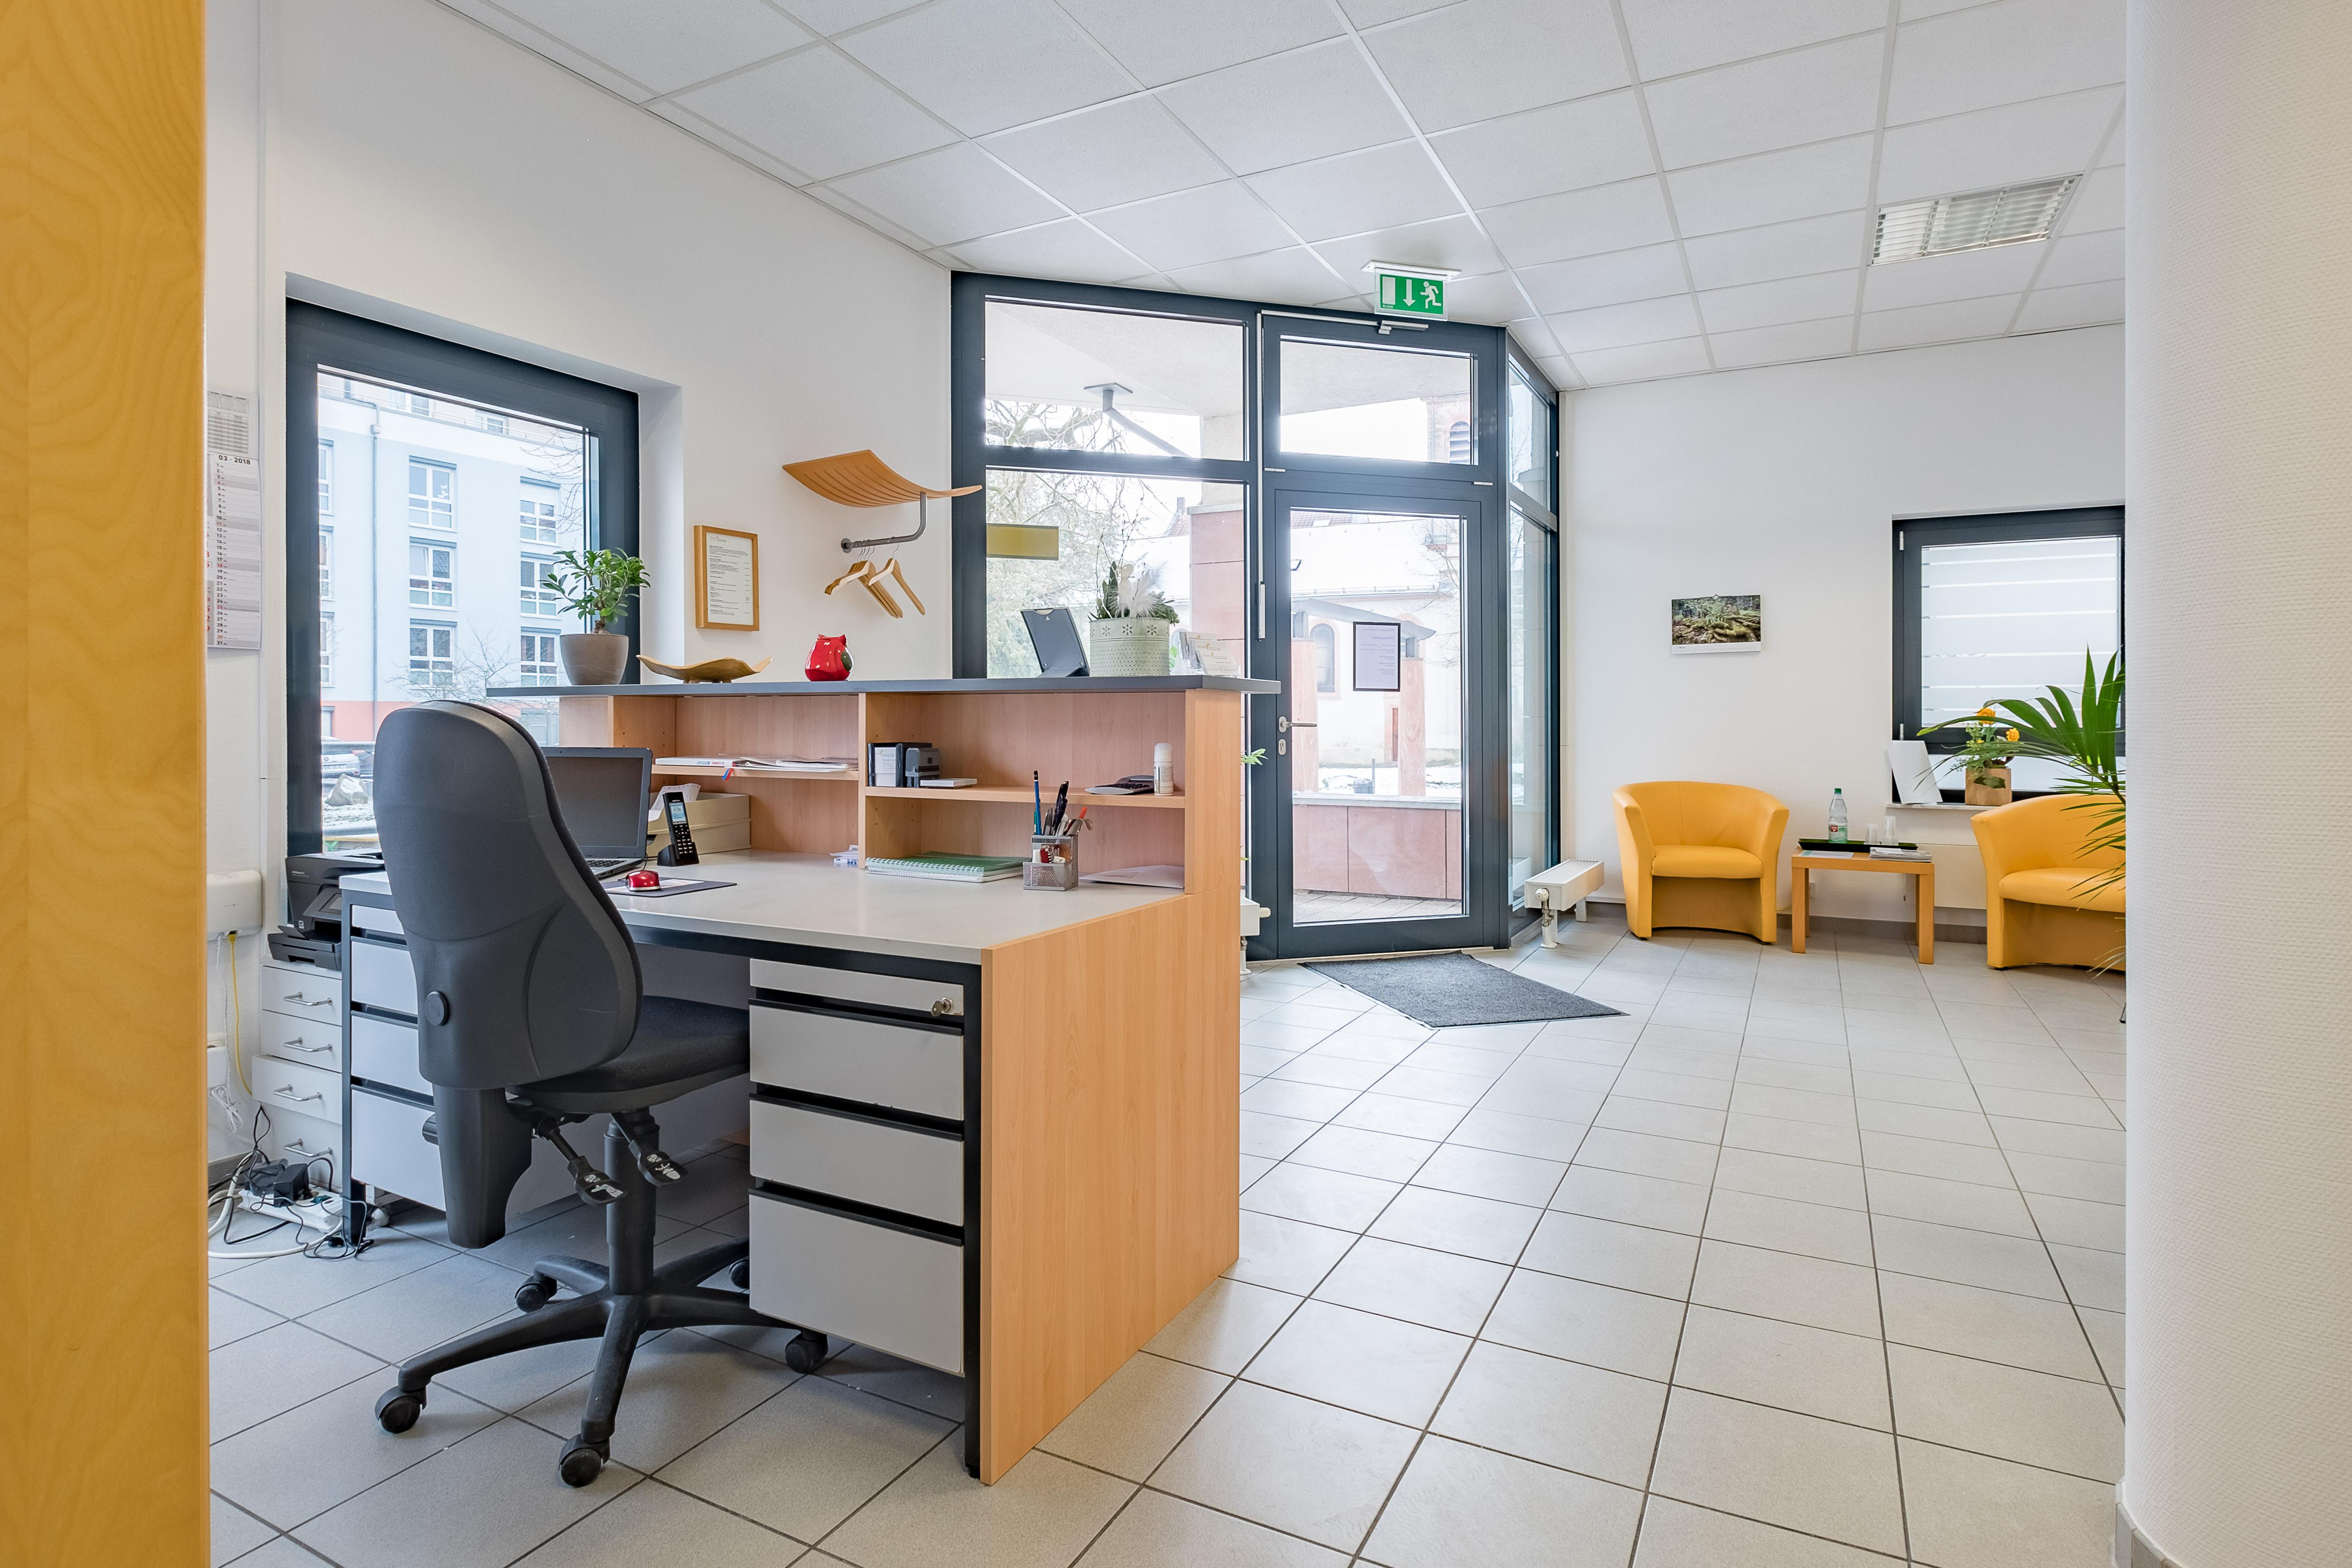 Empfang, Praxis, Wartebereich, Eingang, Kress, Aschaffenburg, Prodologie